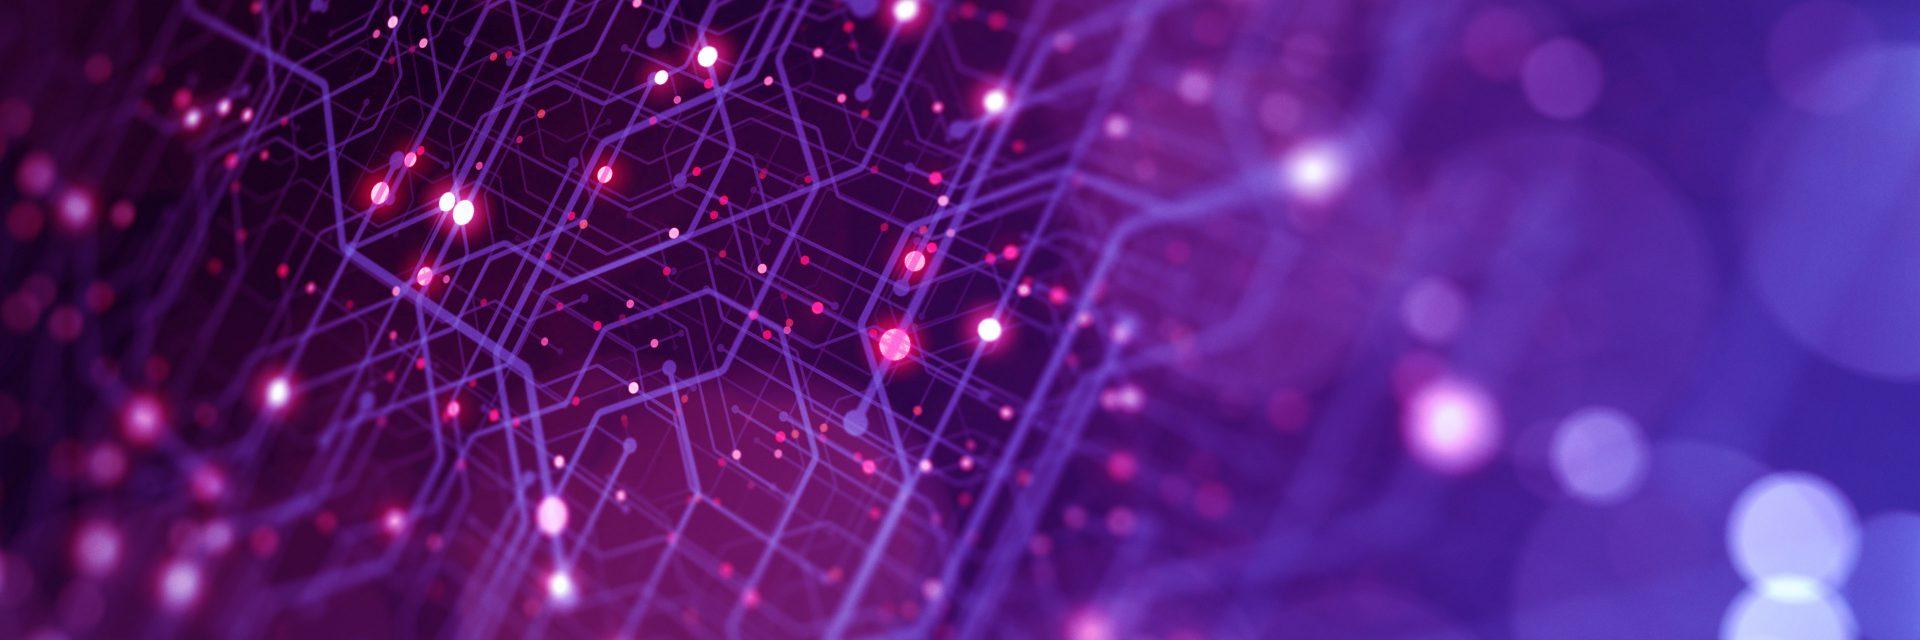 abstract circuits demonstrating digitalization